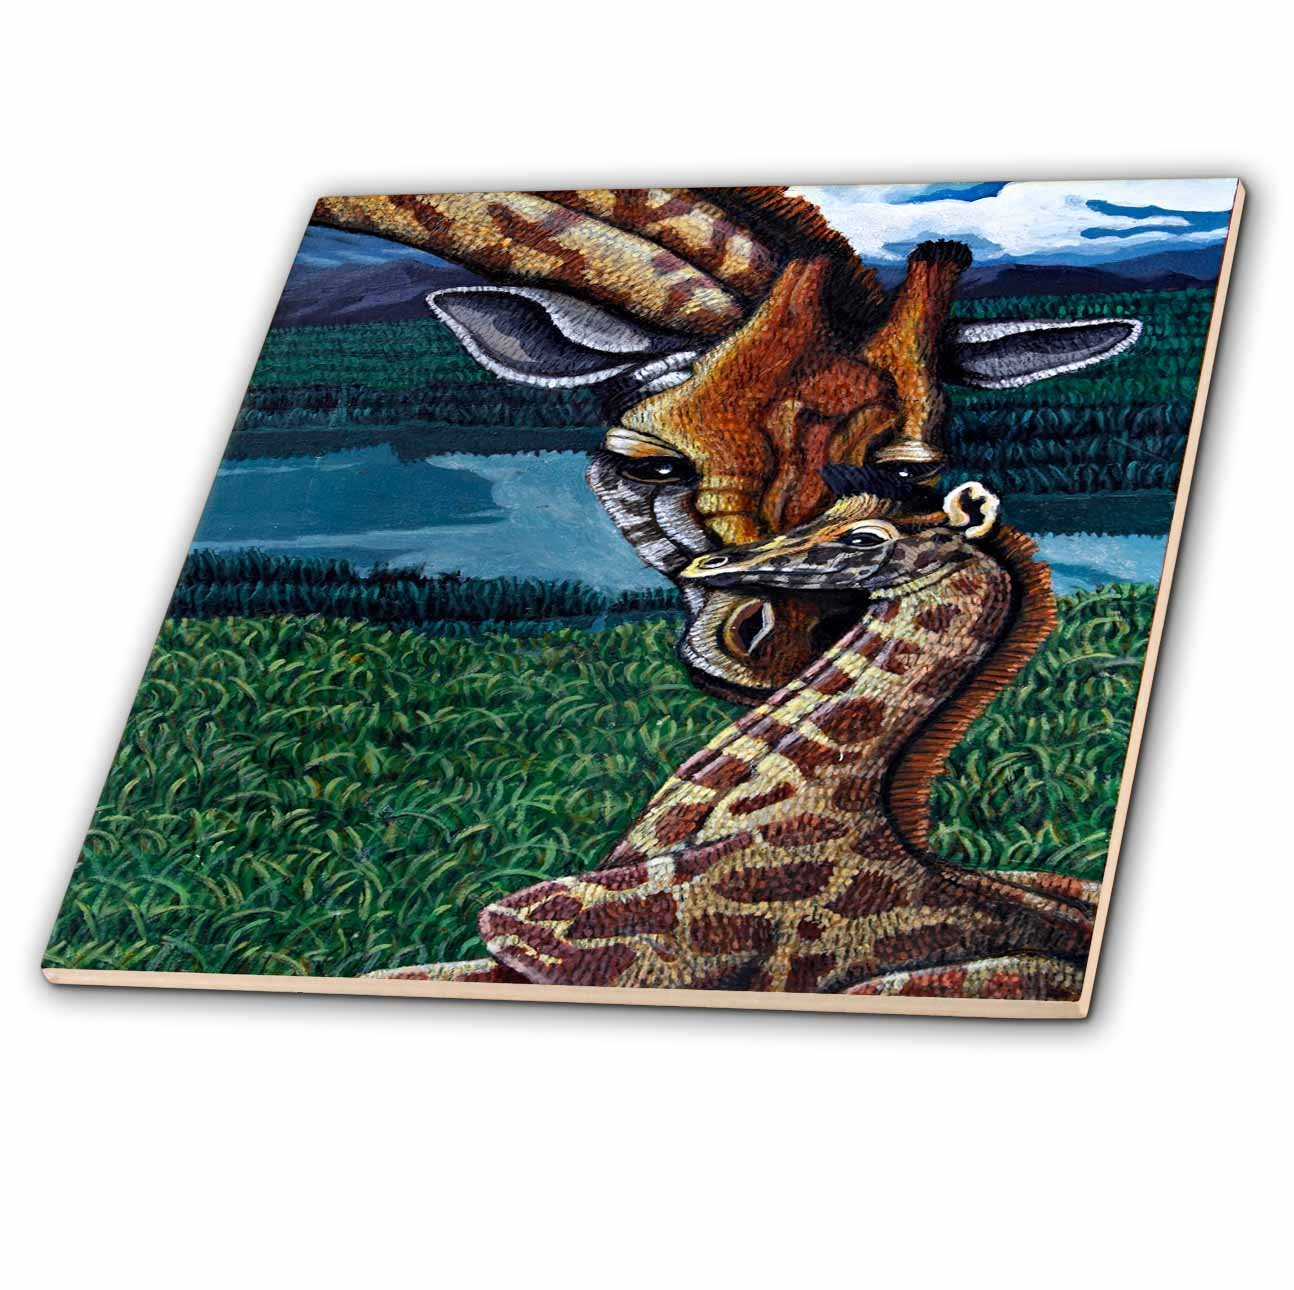 12-Inch 3dRose ct/_3235/_4 Giraffe Mother Ceramic Tile